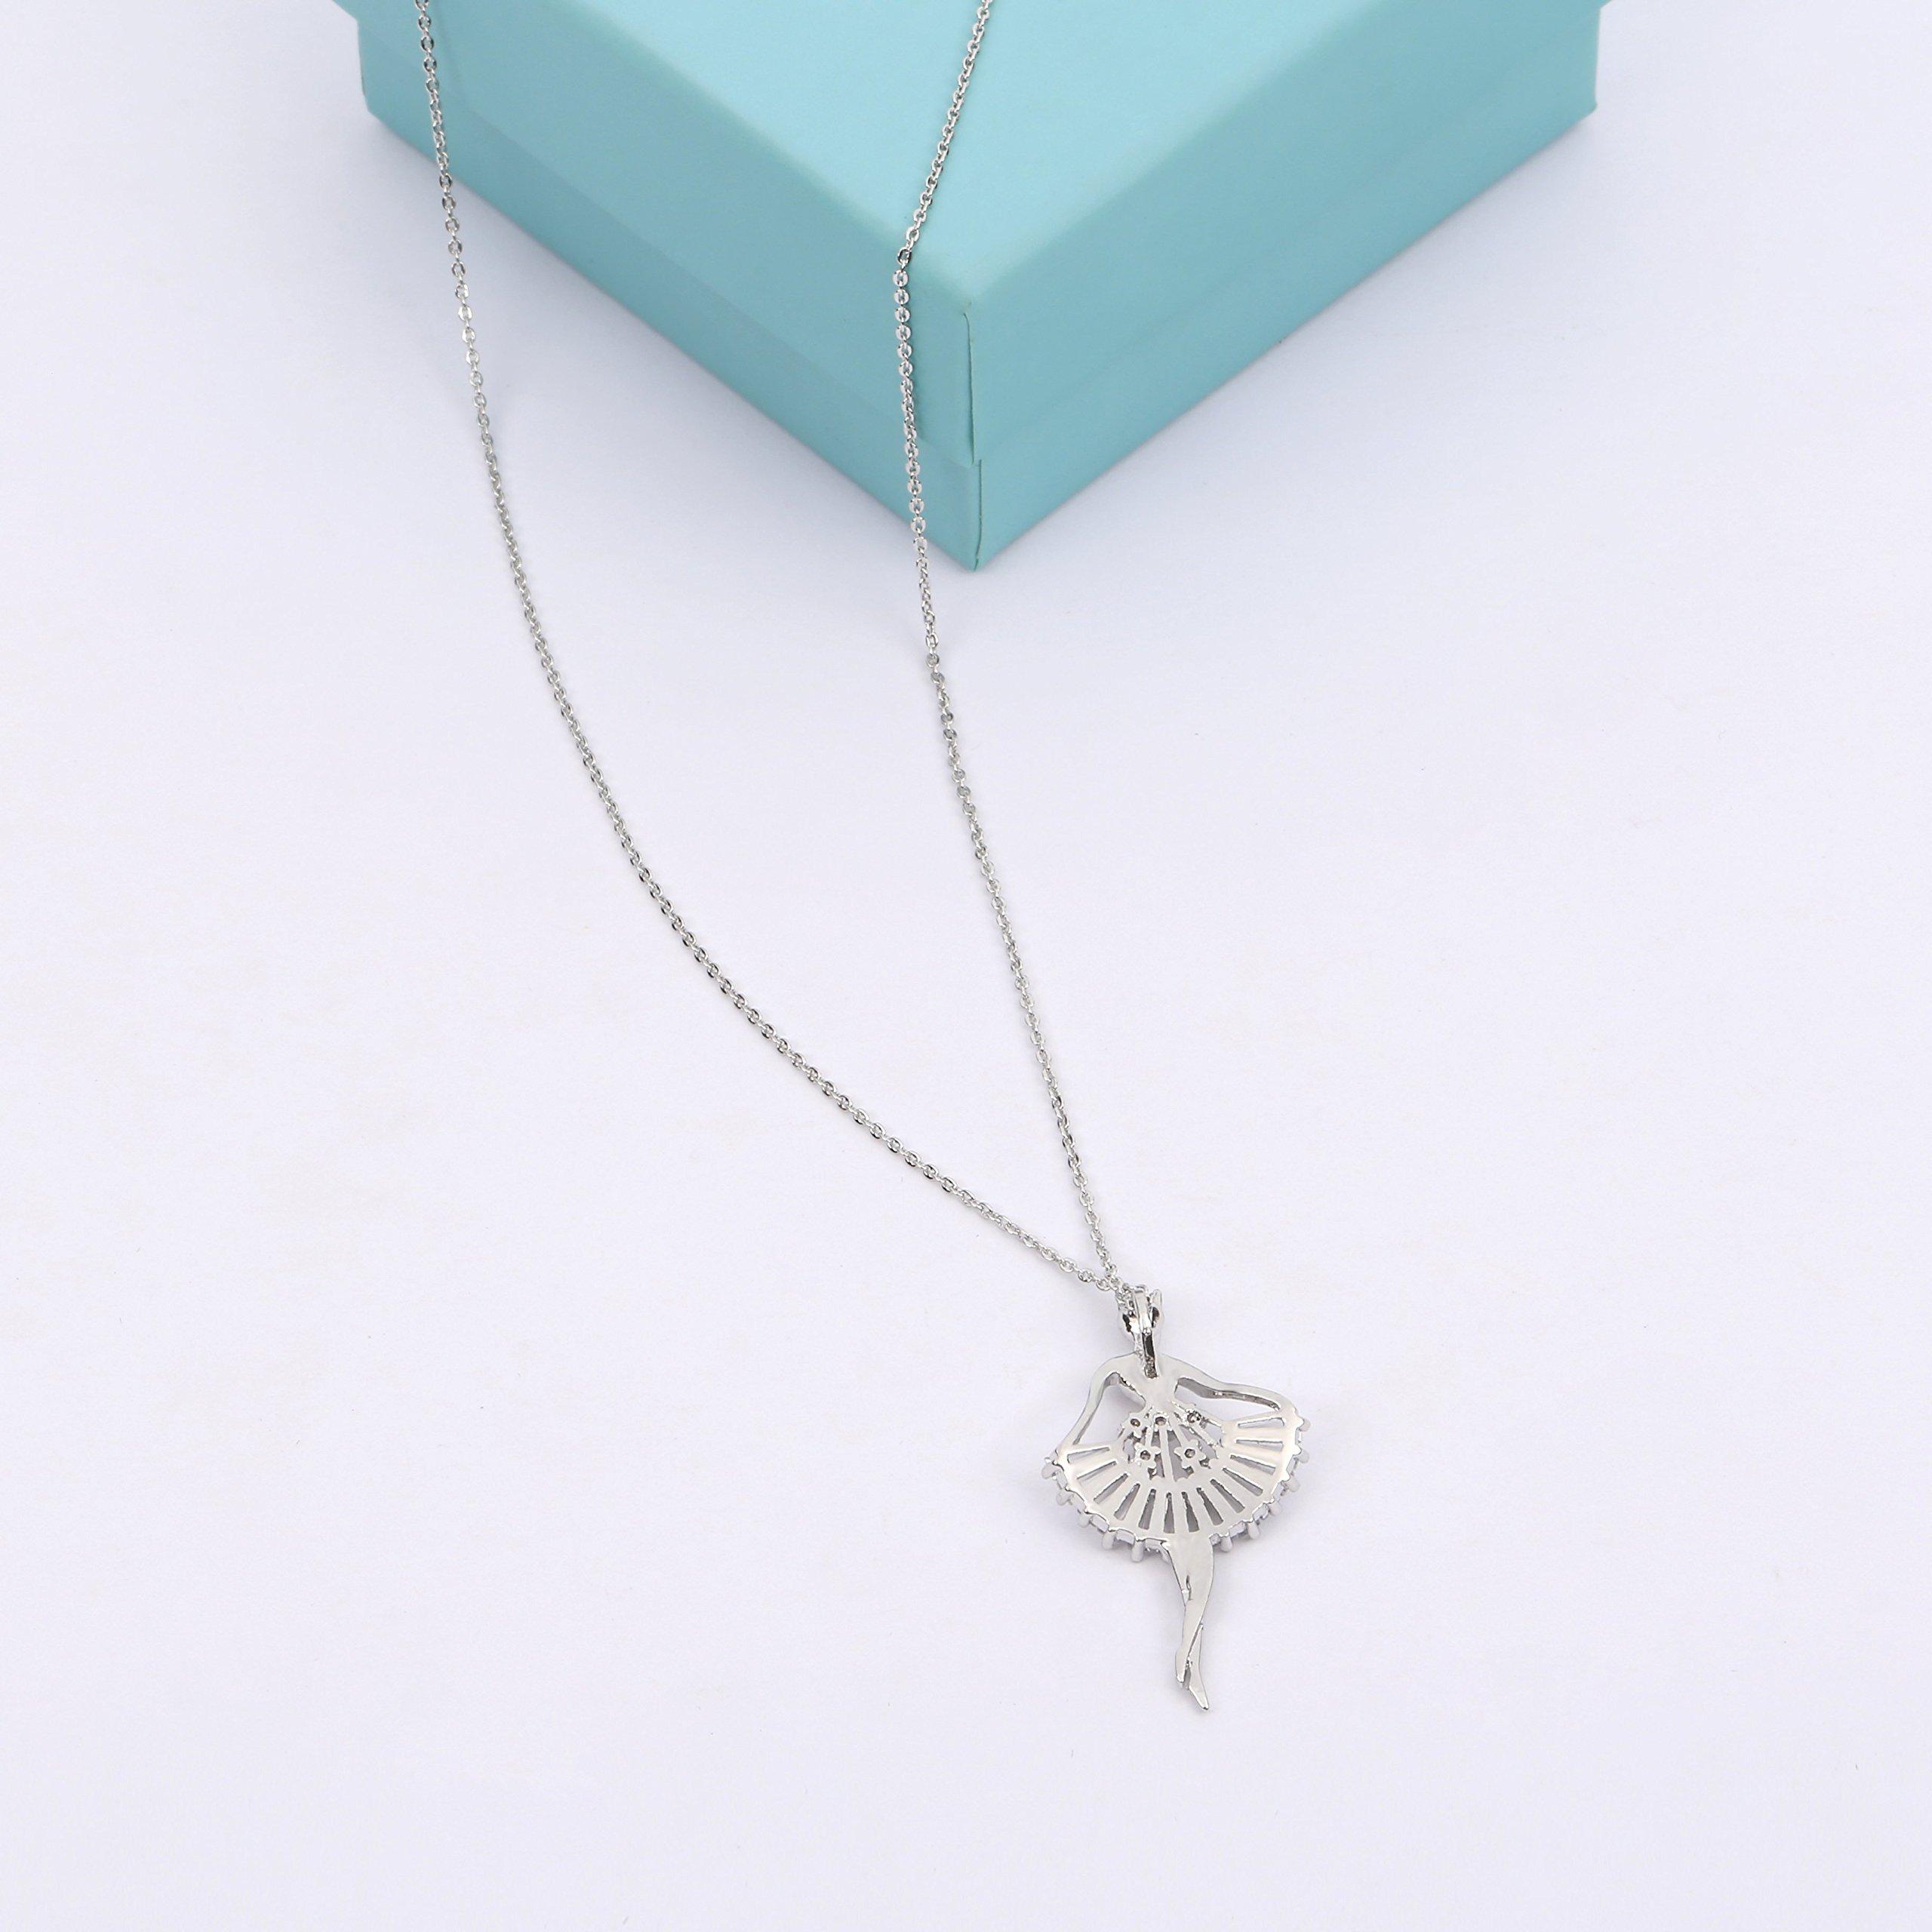 MYKEA Elegant Jewelry Set for Women 18K White Gold Ballerina Girl Pendant Necklace with Cubic Zirconia Stud Earrings for Teen Girls Jewelry by MYKEA (Image #5)